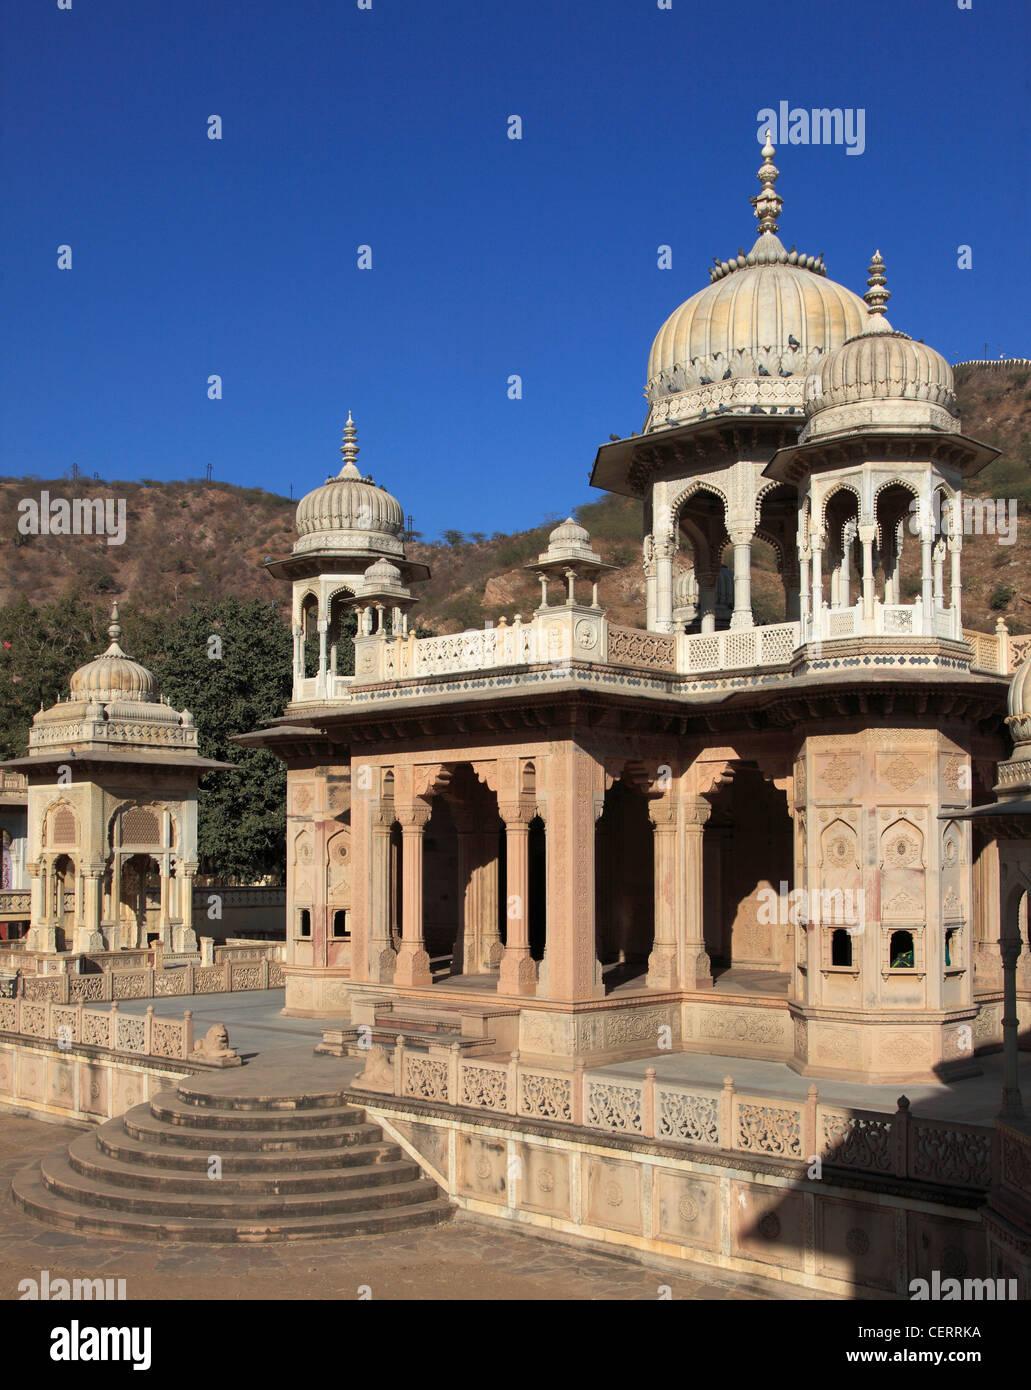 India, Rajasthan, Jaipur, Royal Gaitor, cenotaphs, - Stock Image